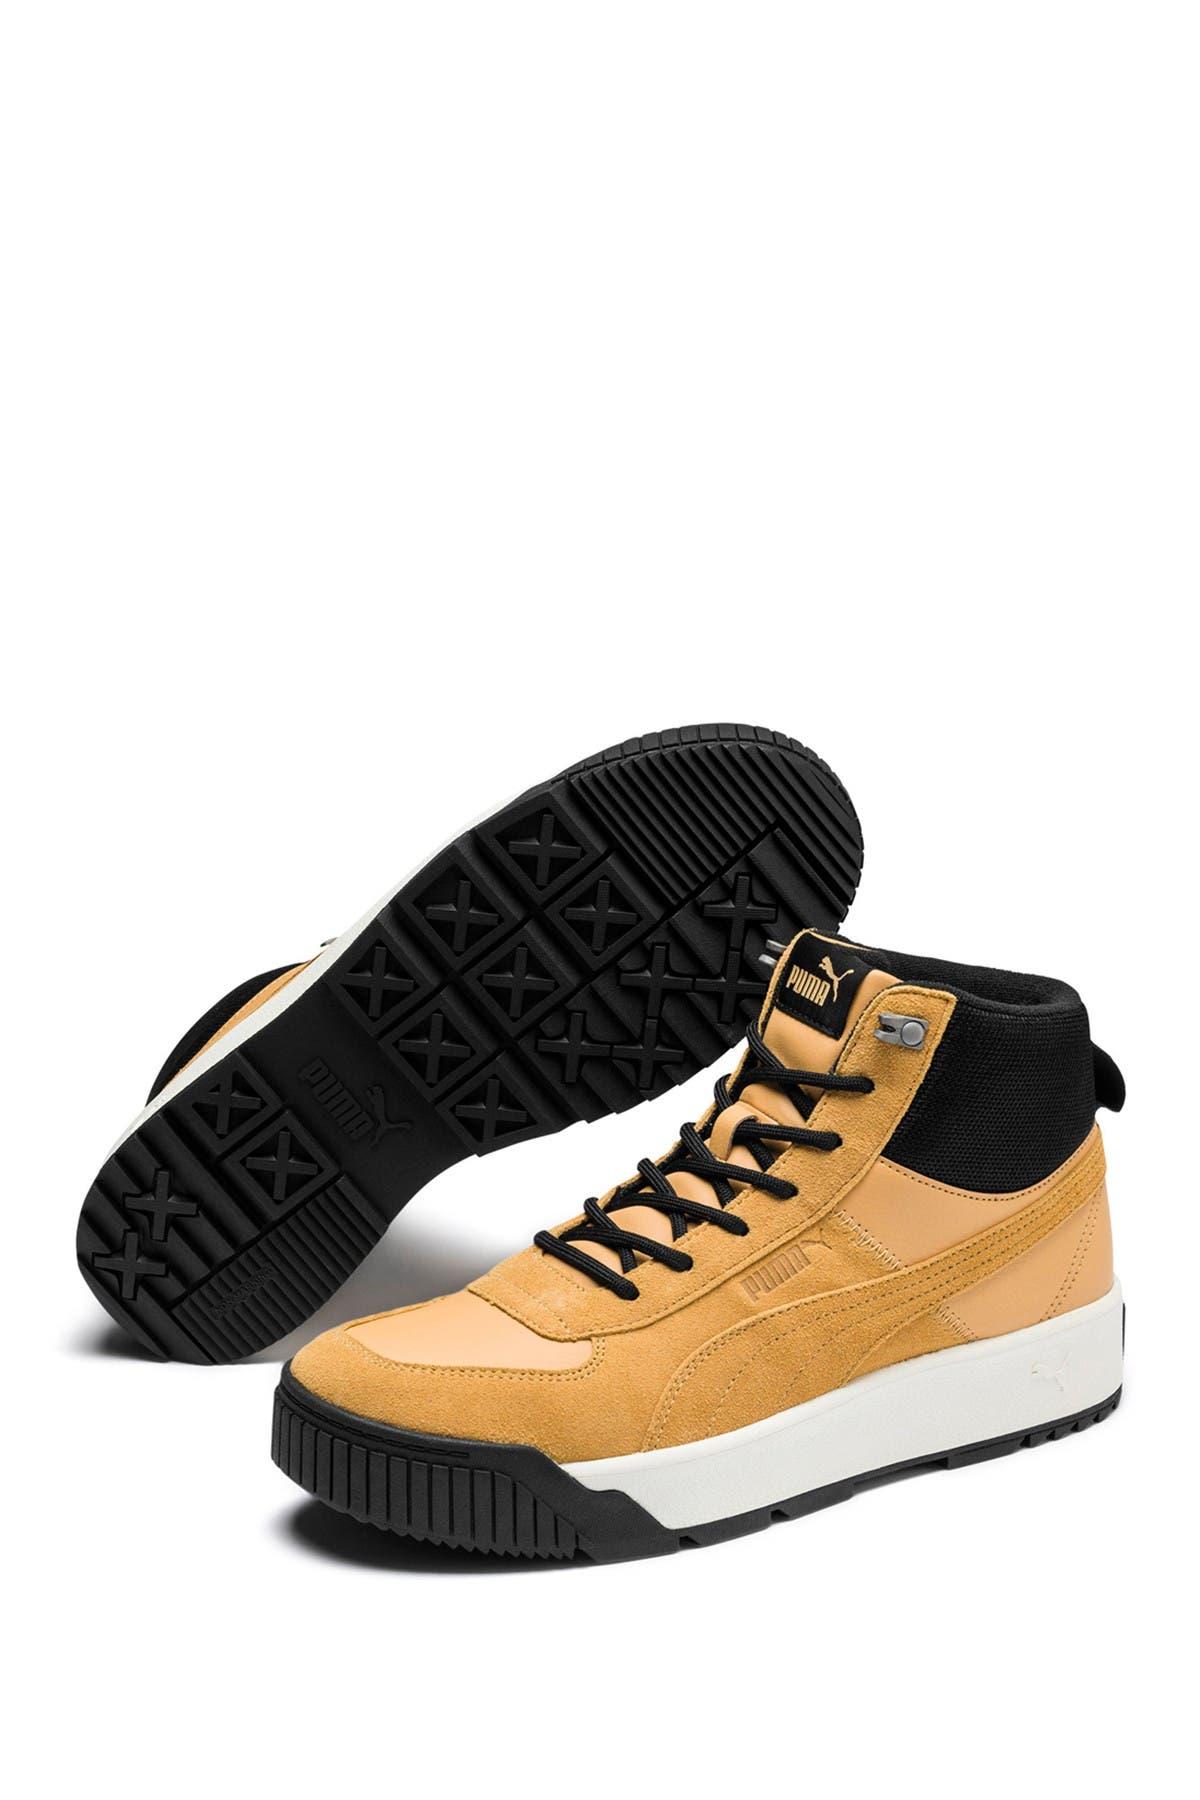 Image of PUMA Tarrenz SB Sneaker